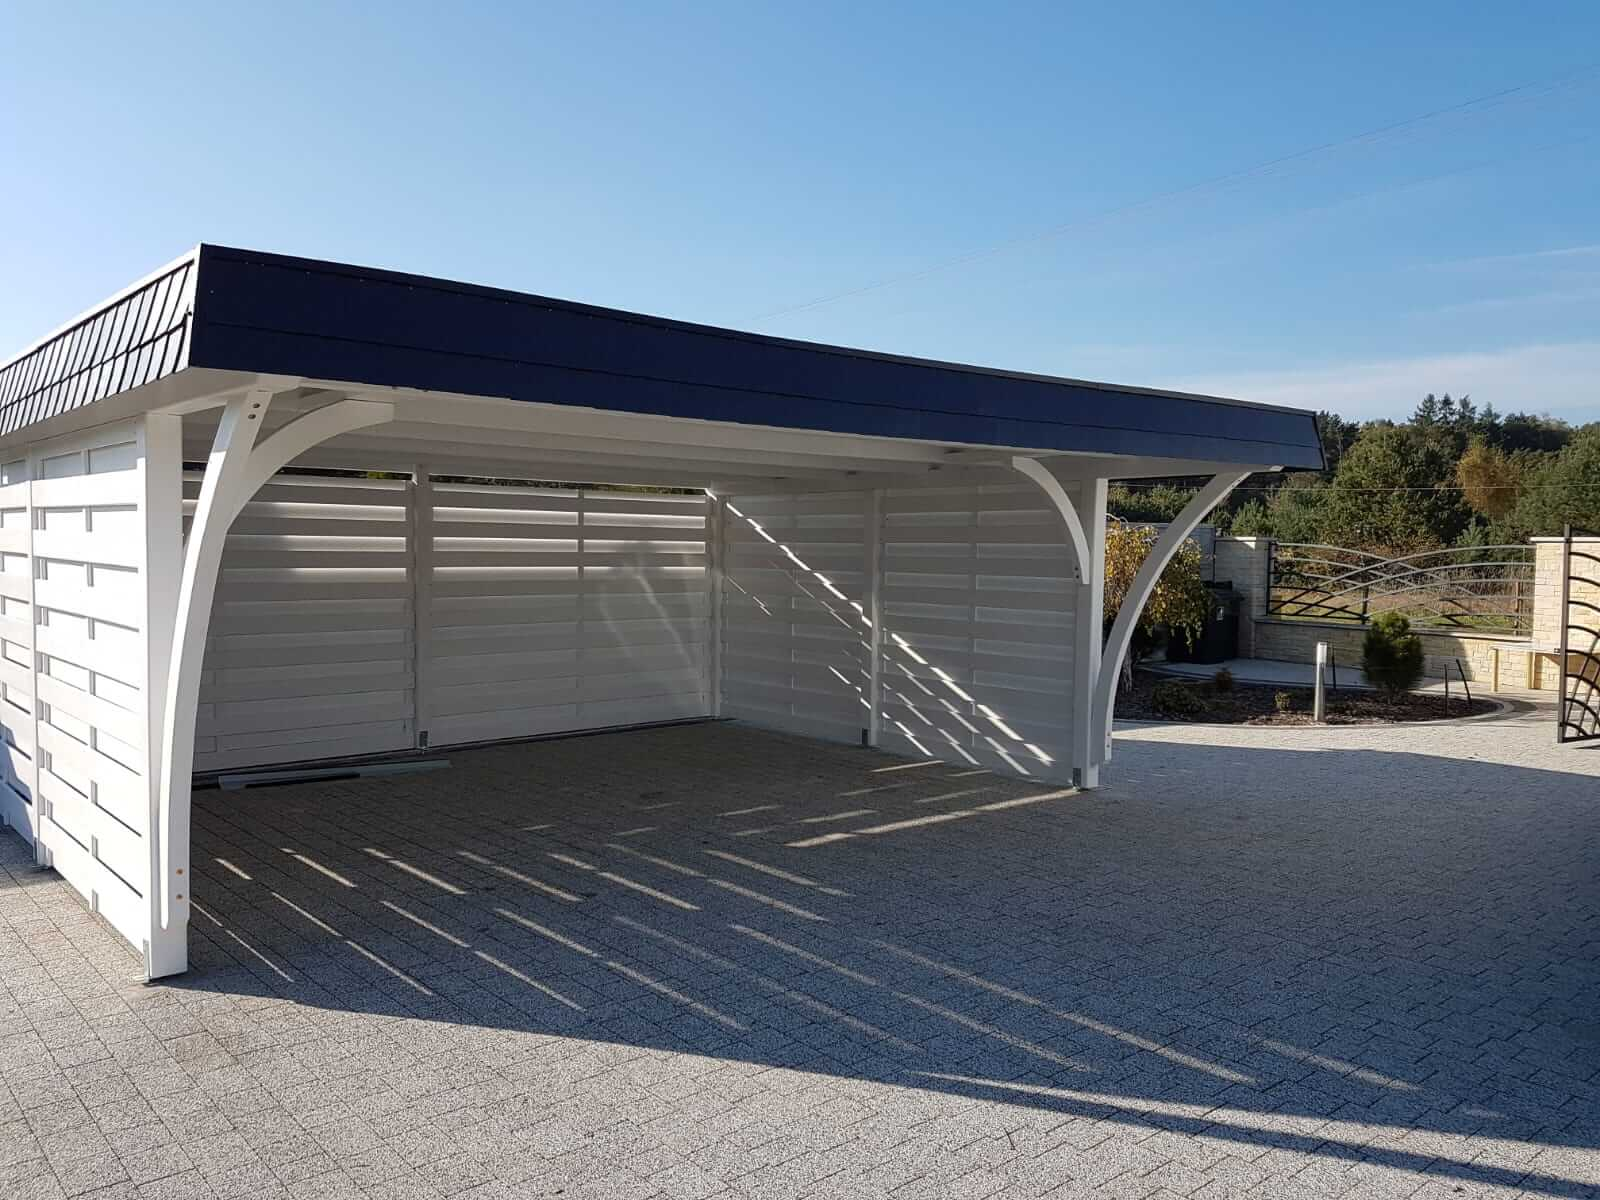 garaż wiata korsyka kempar